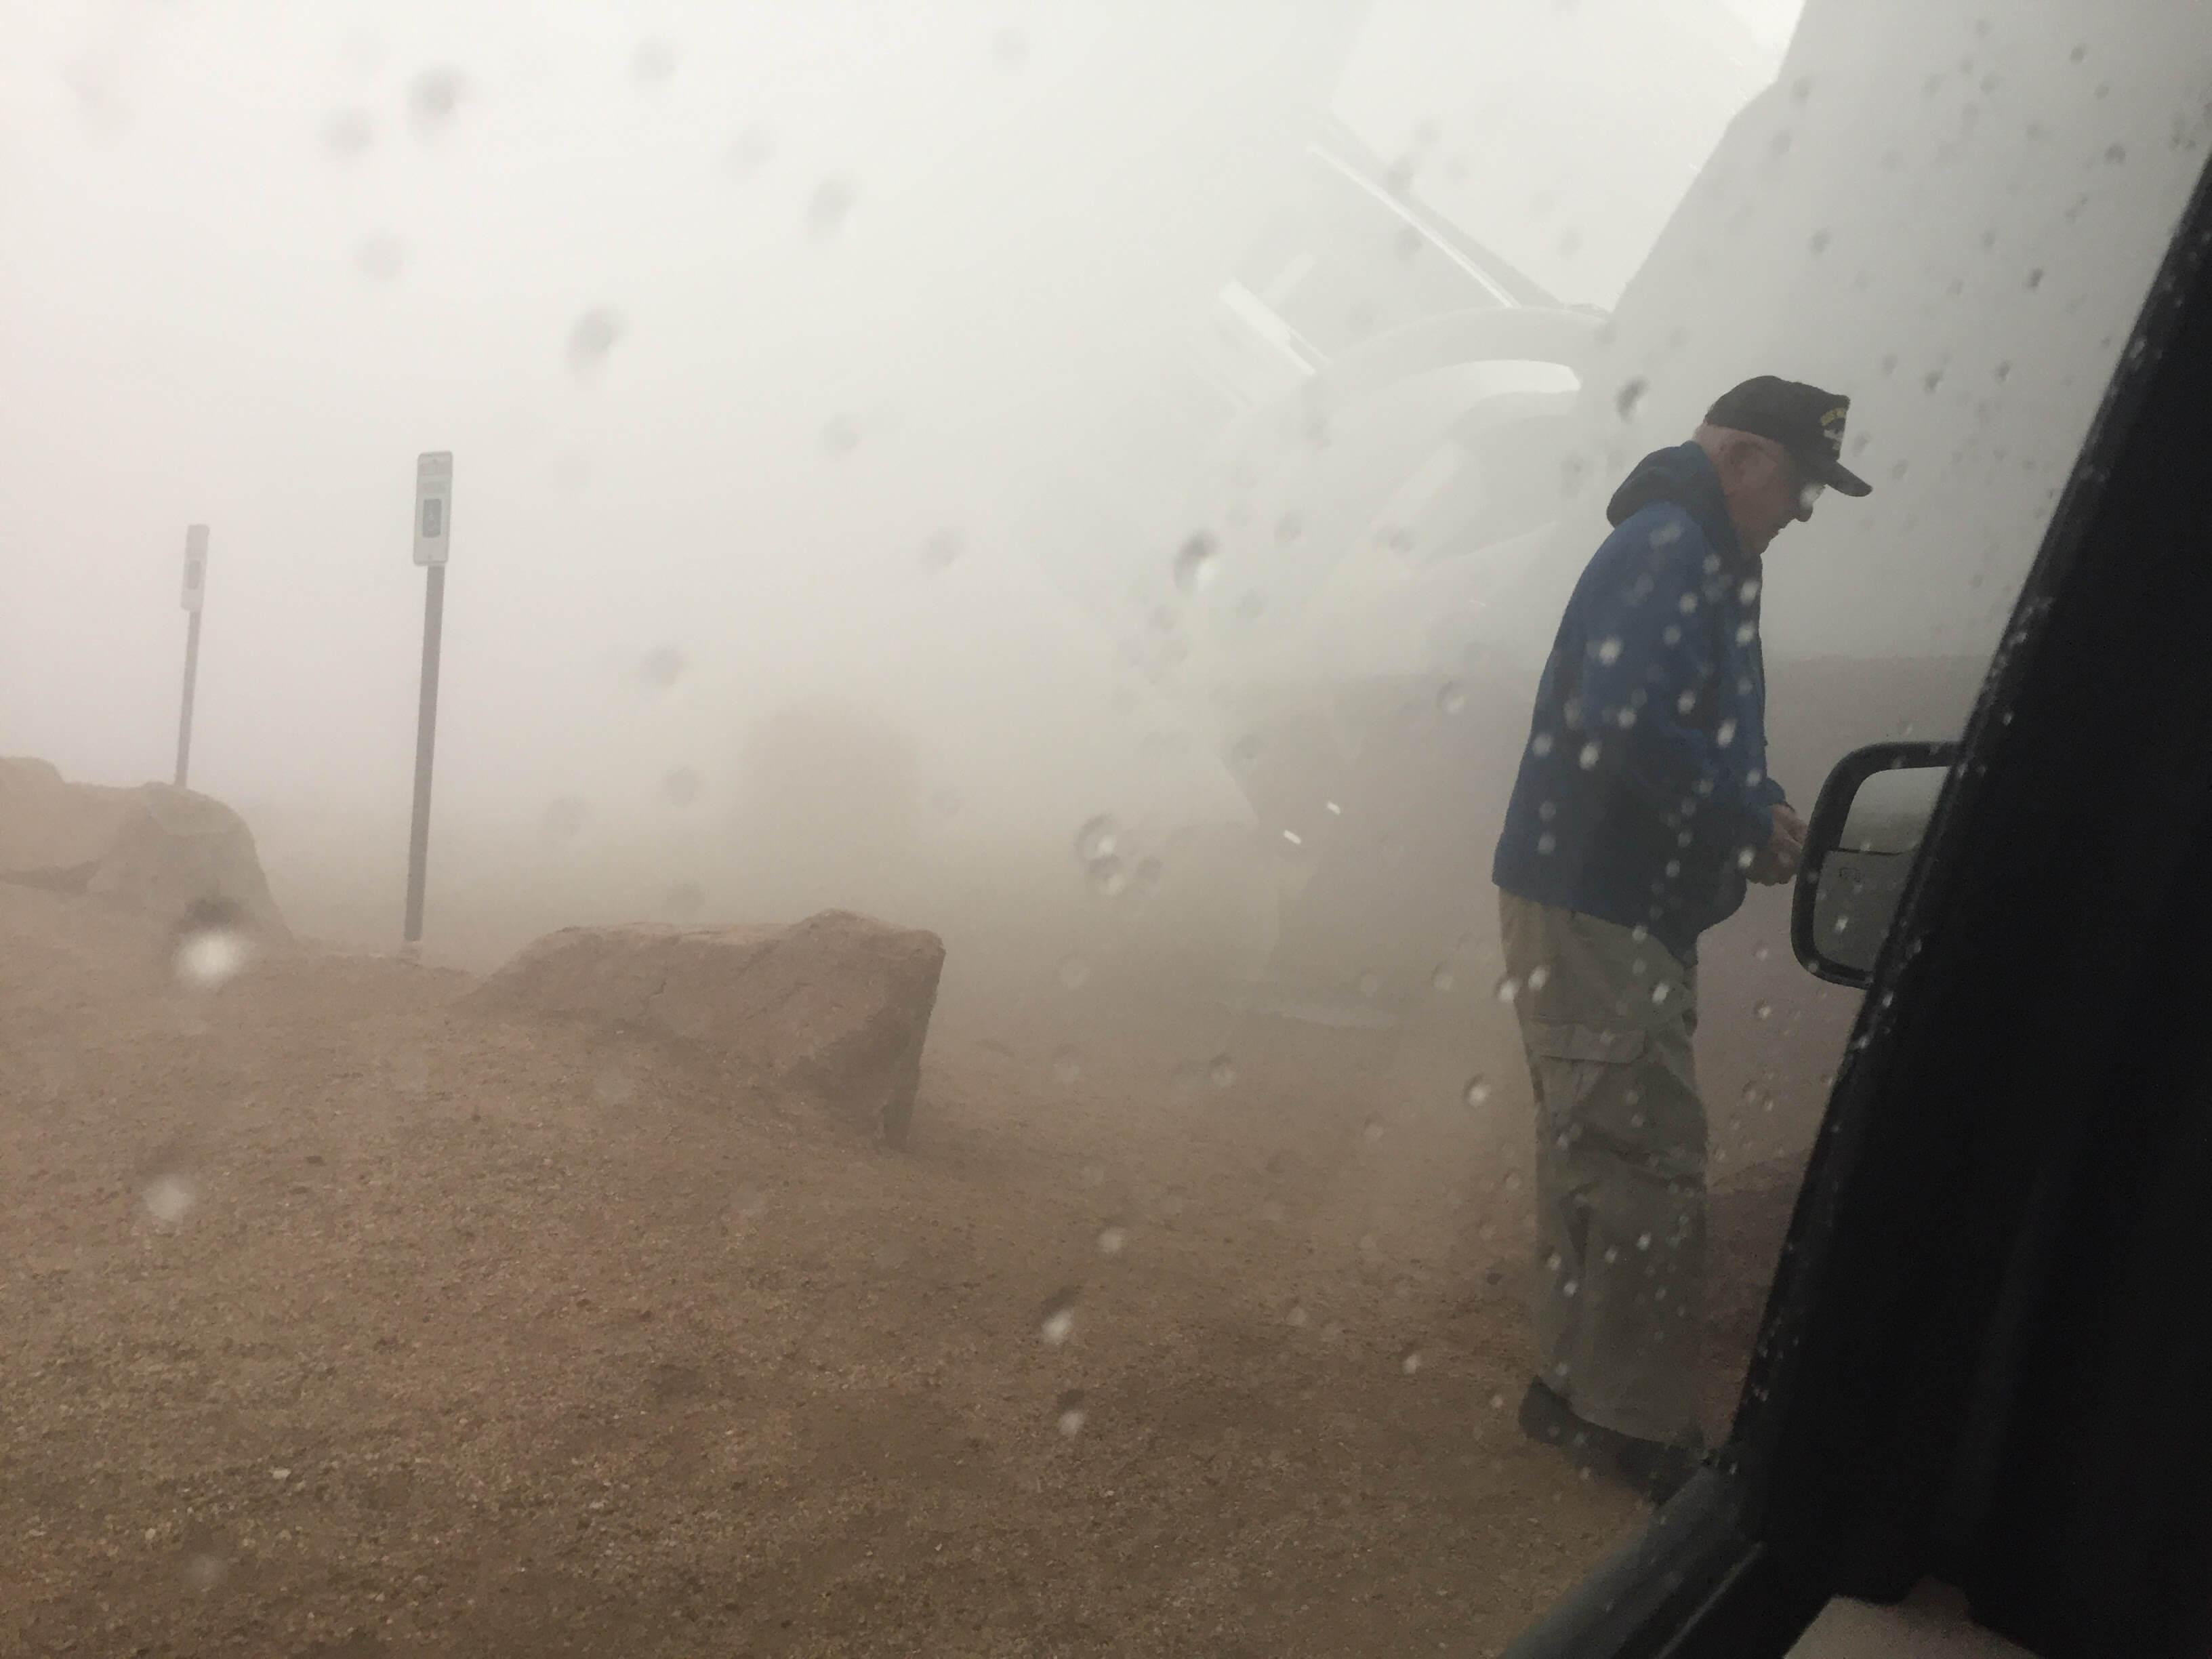 Snowy, 39 degrees, Pikes Peak, Colorado, 2017